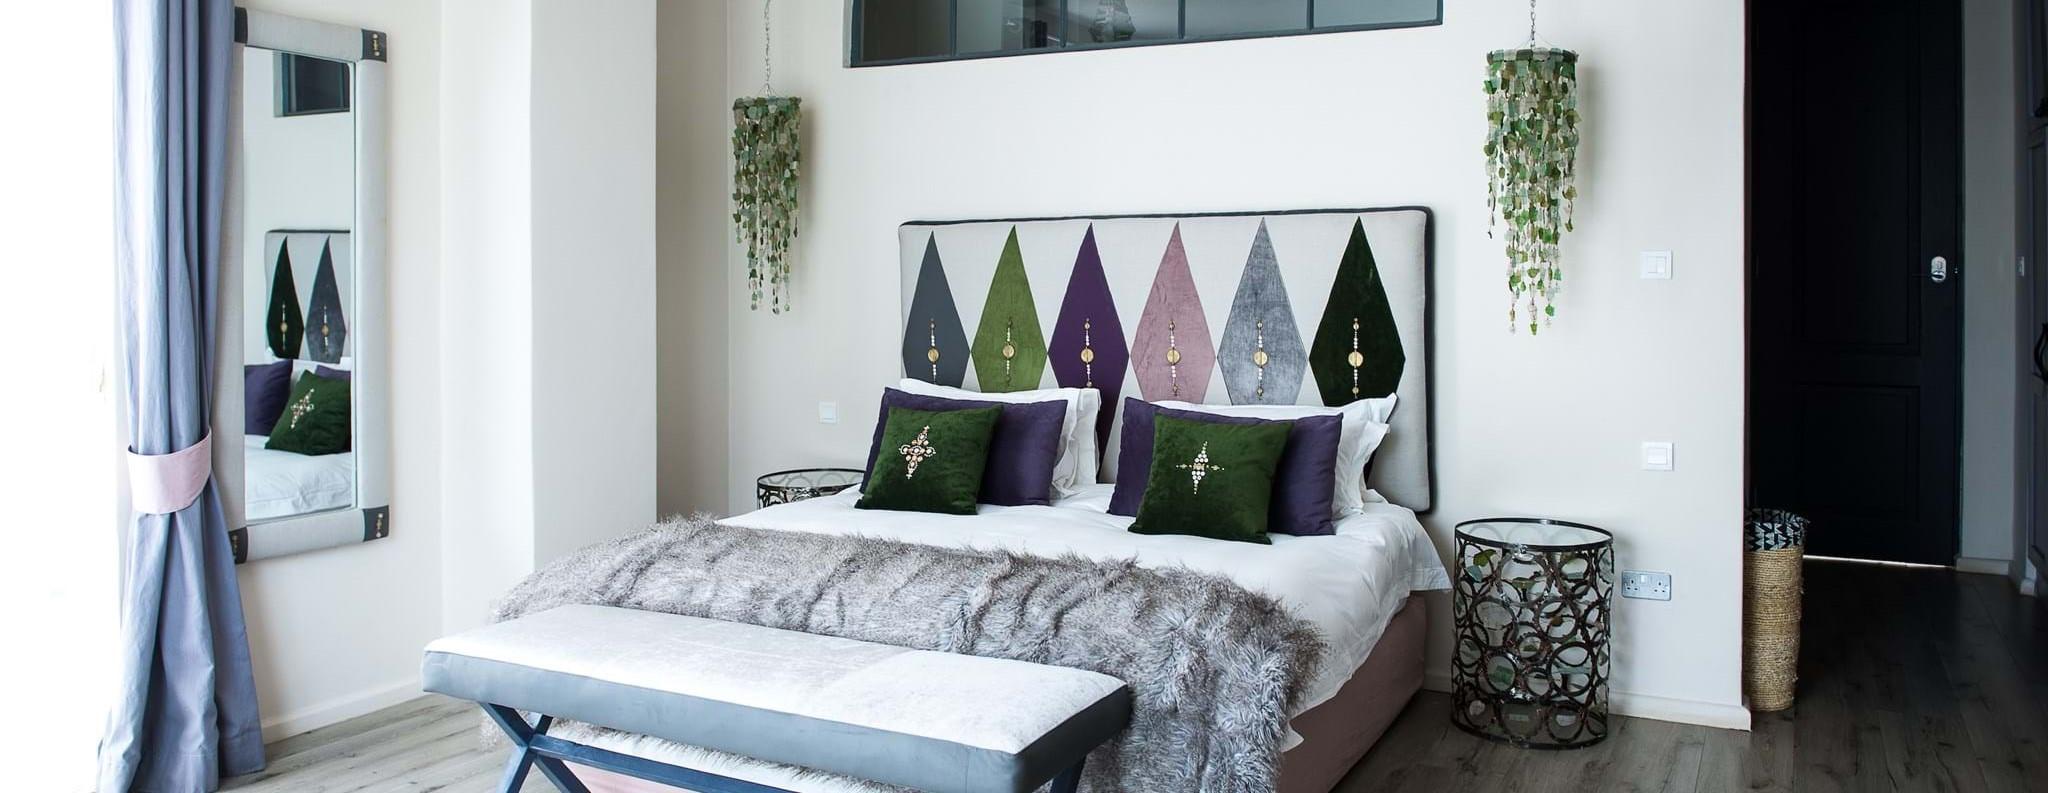 latitude-15-hotel-luxury-bedroom